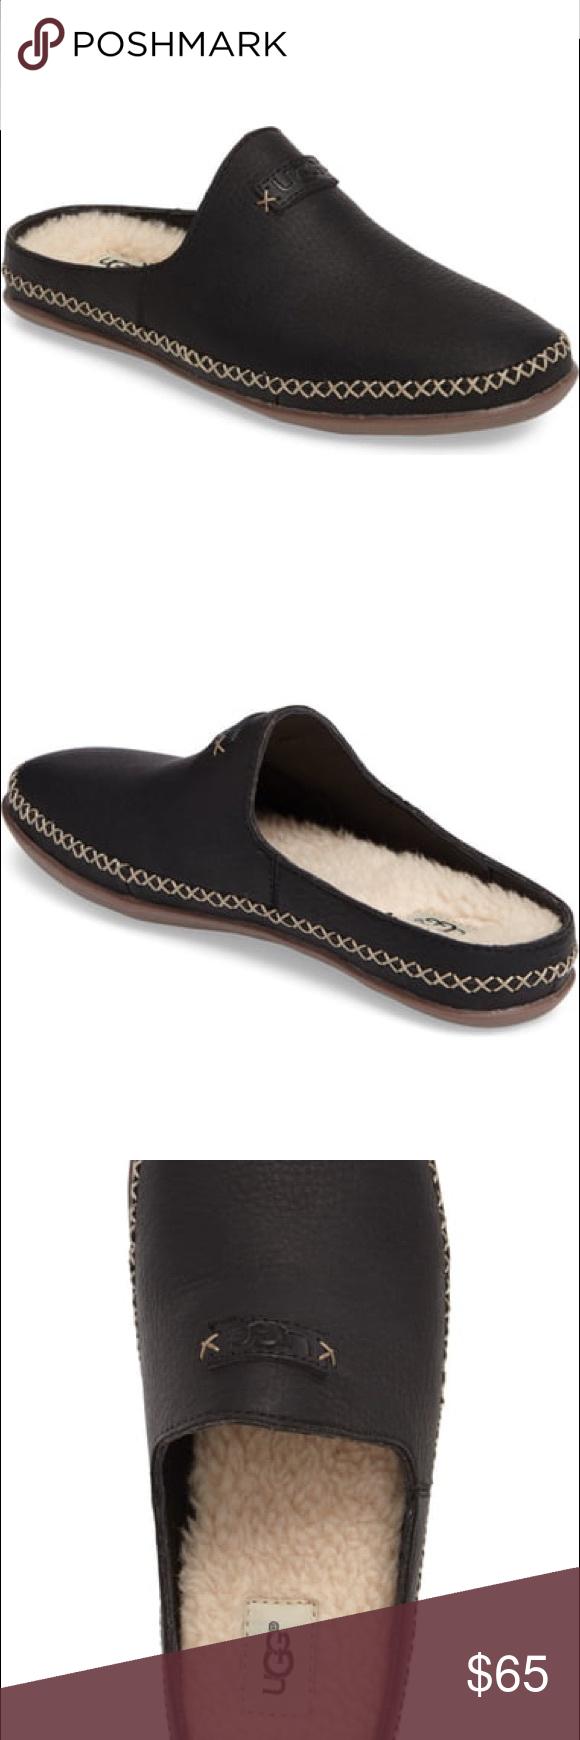 Ugg Tamara slippers size 8   Slippers